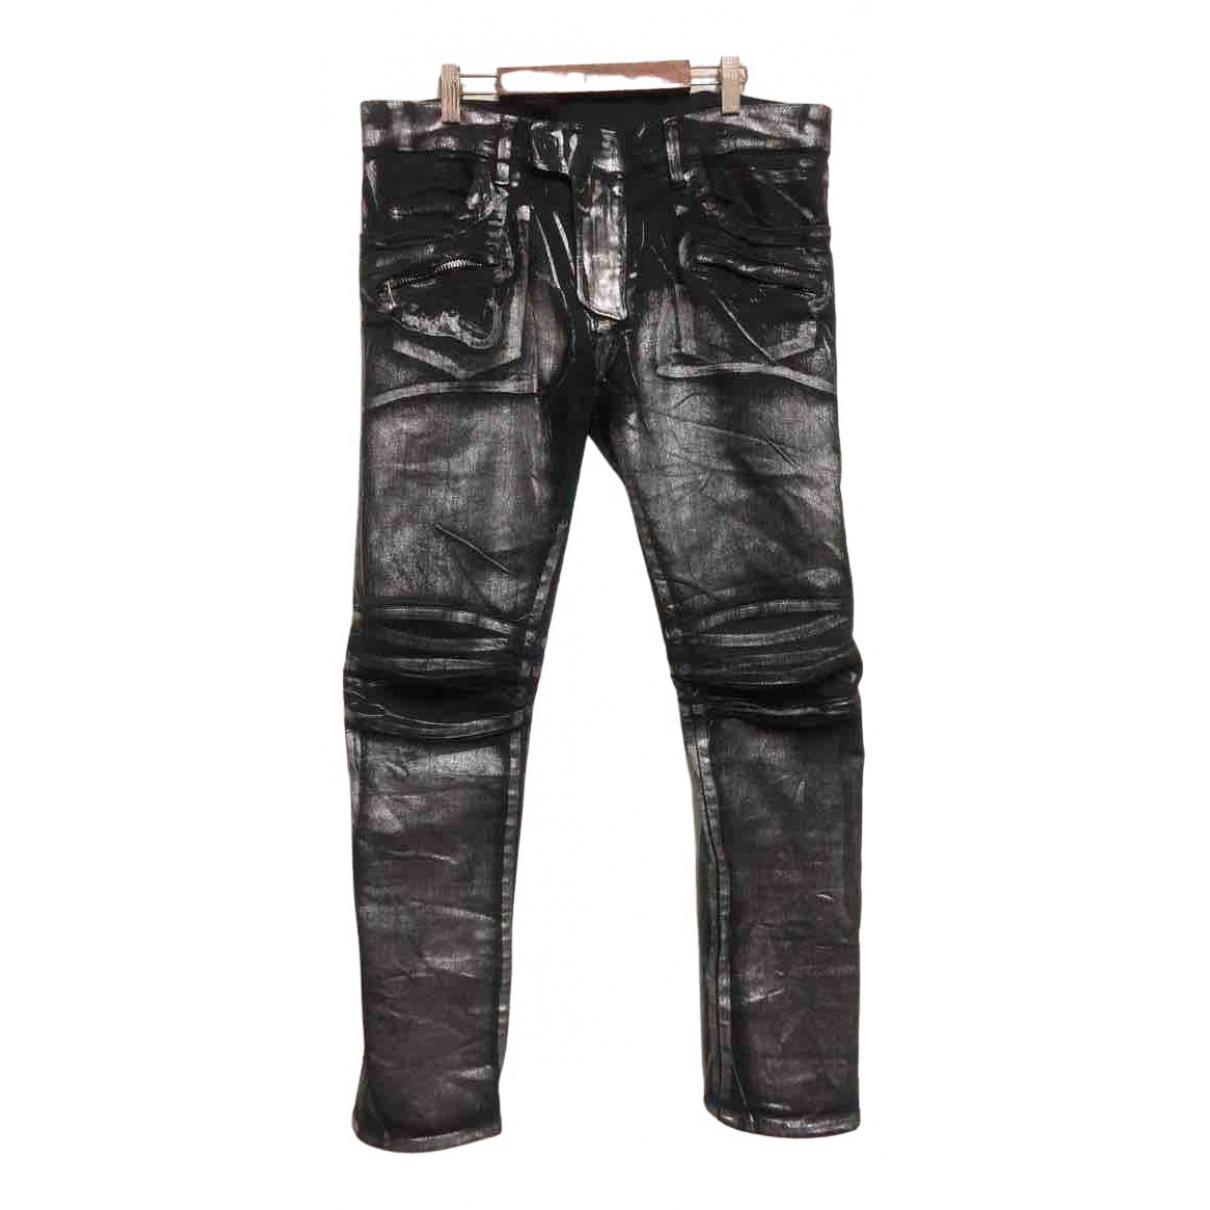 Balmain \N Cotton - elasthane Jeans for Men 32 US